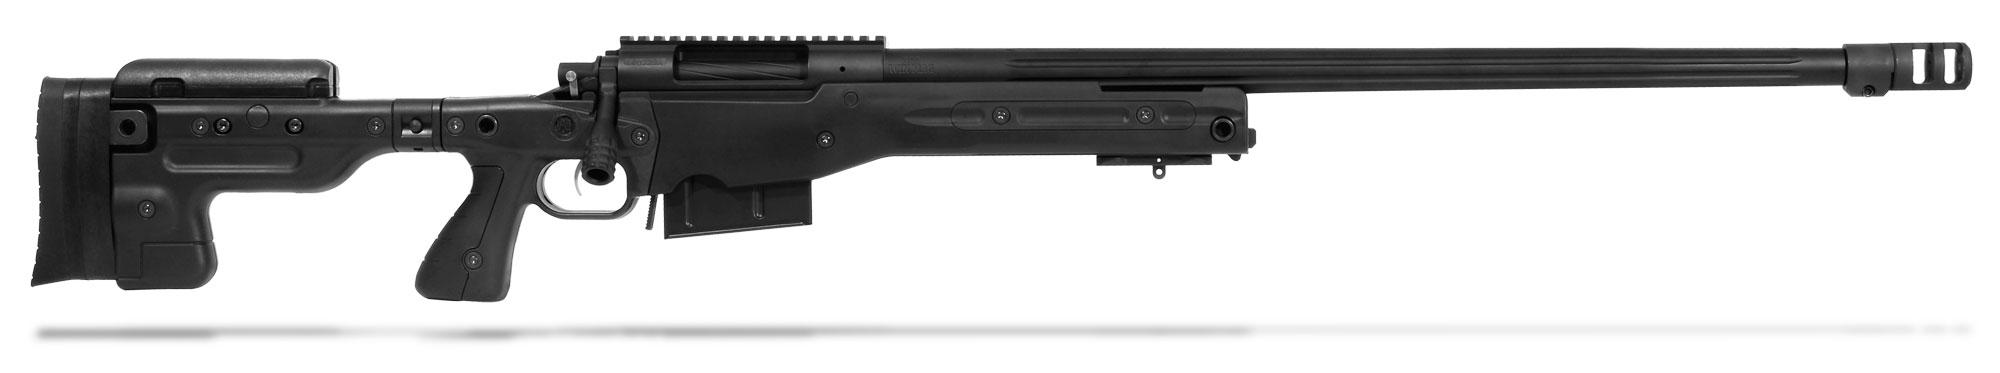 Surgeon Scalpel 300 Winchester Black Rifle